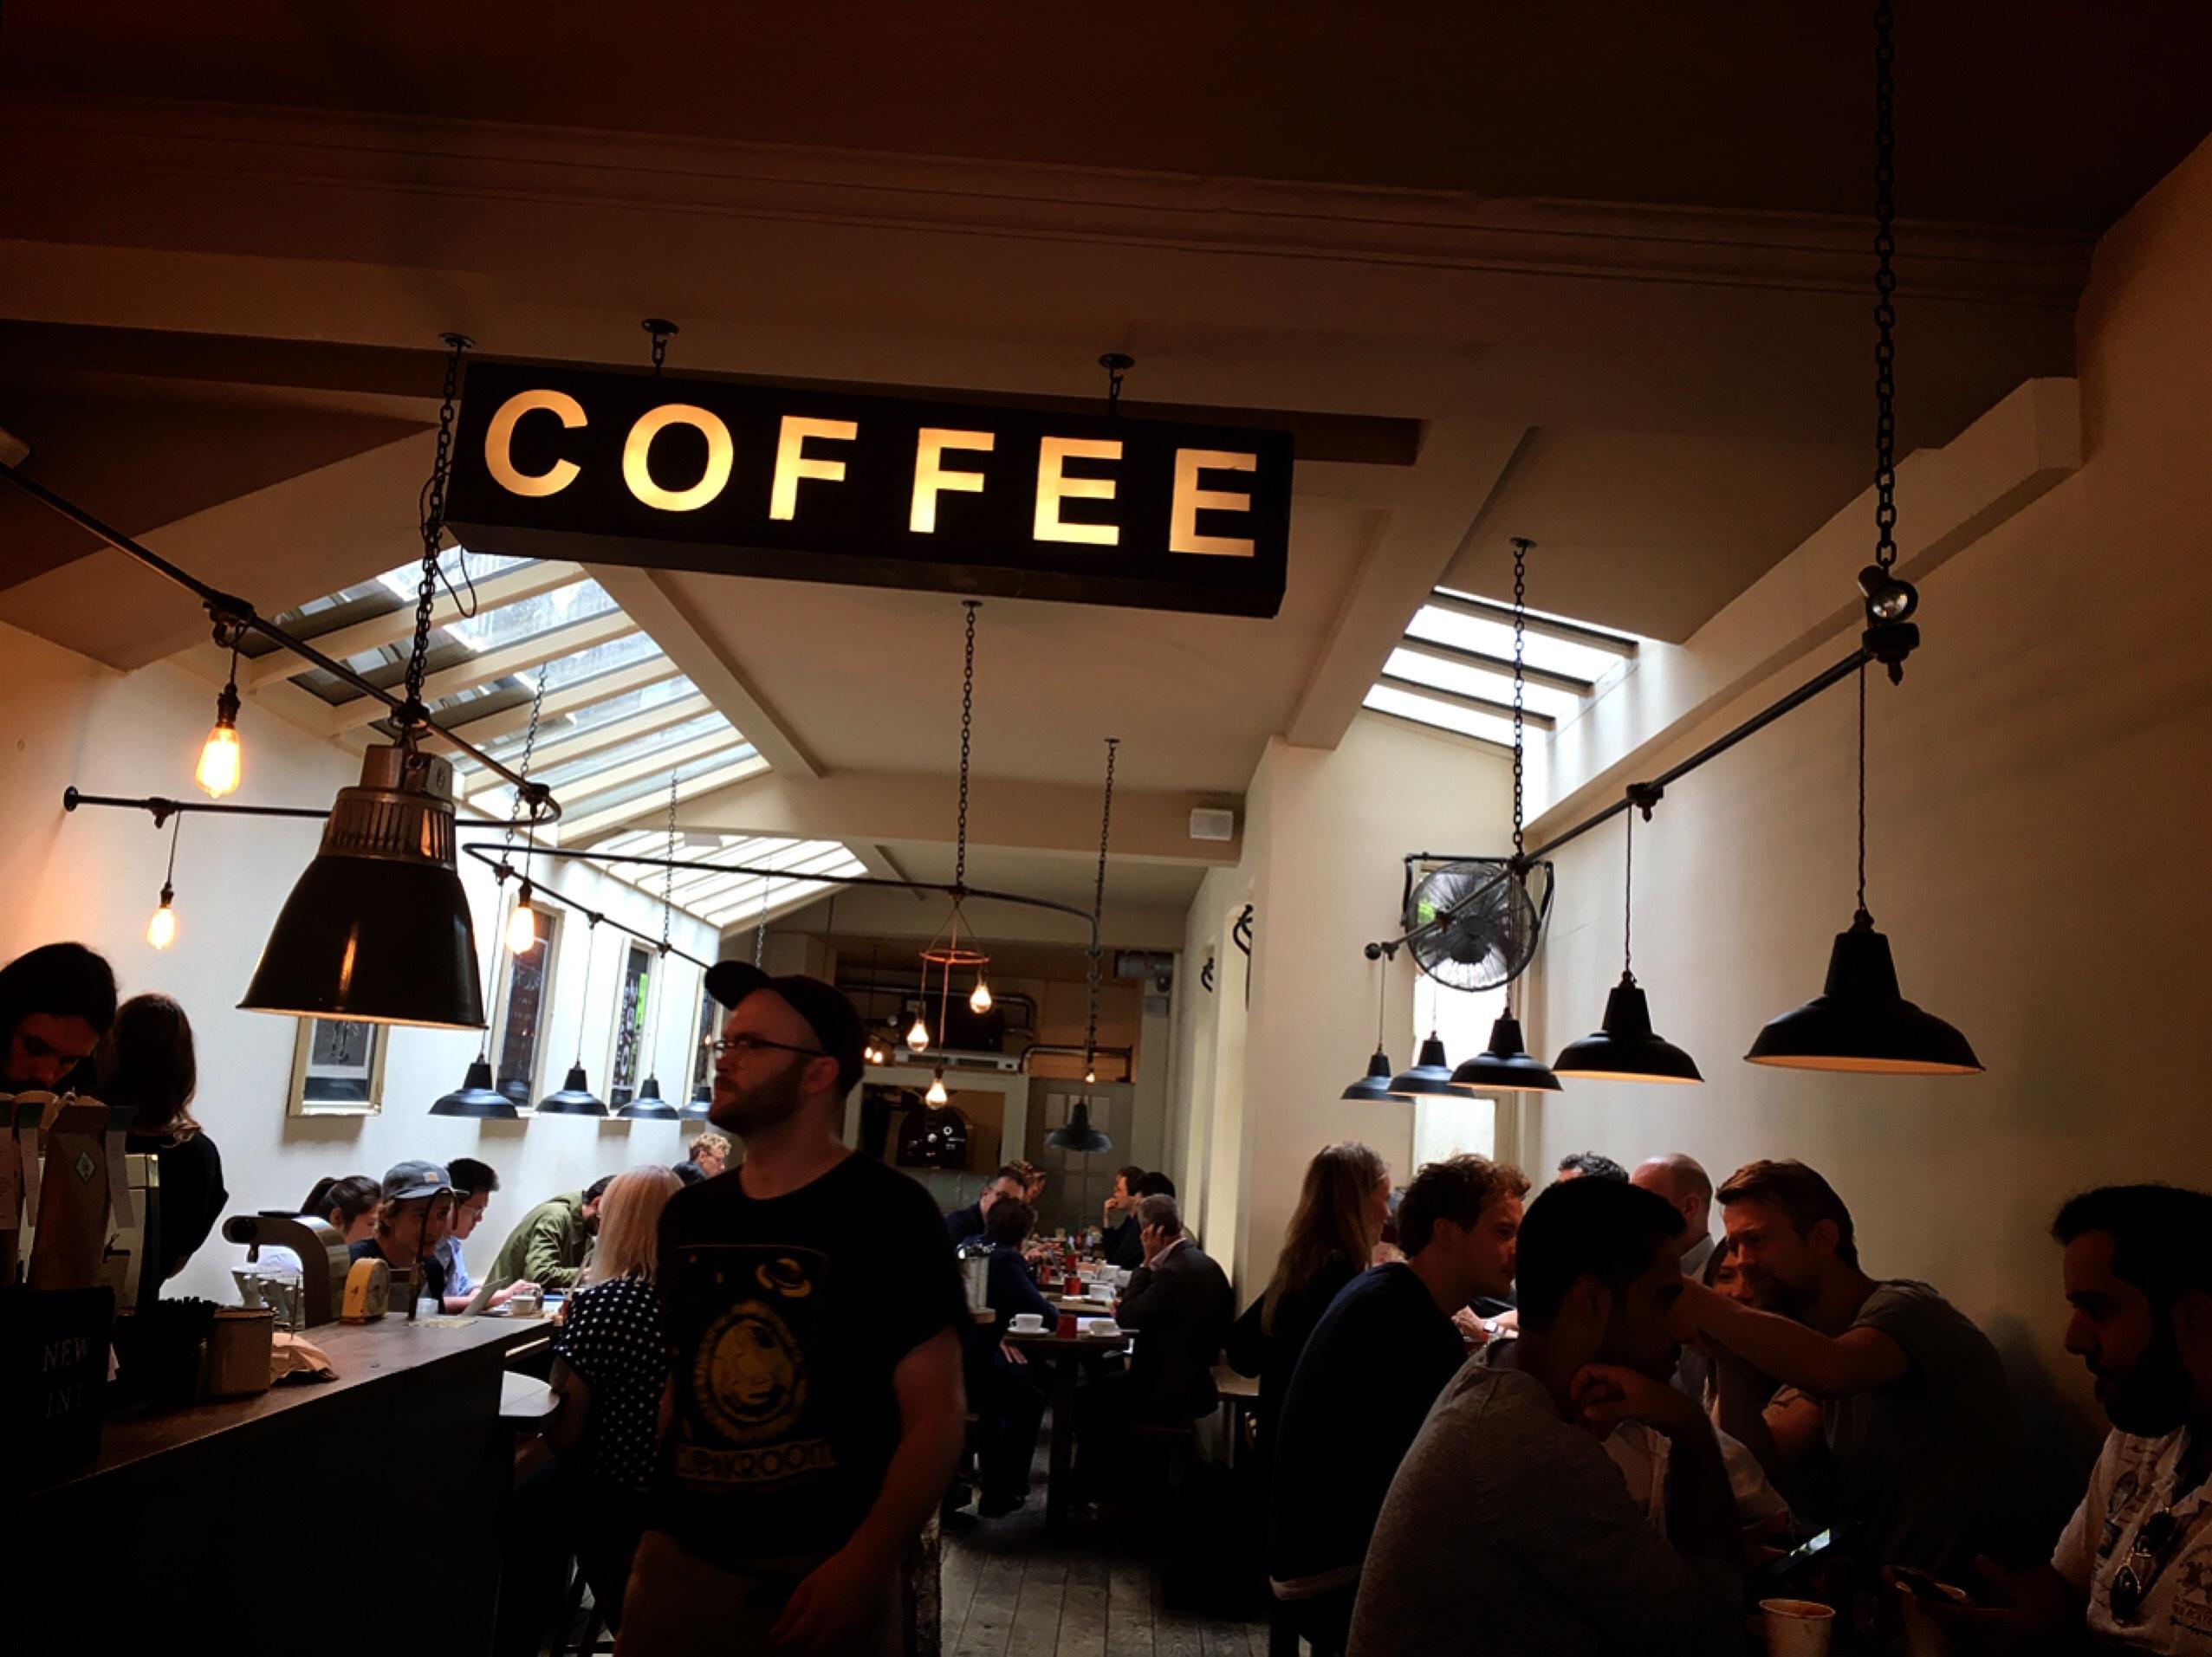 @London コーヒー屋さん_1_2-3